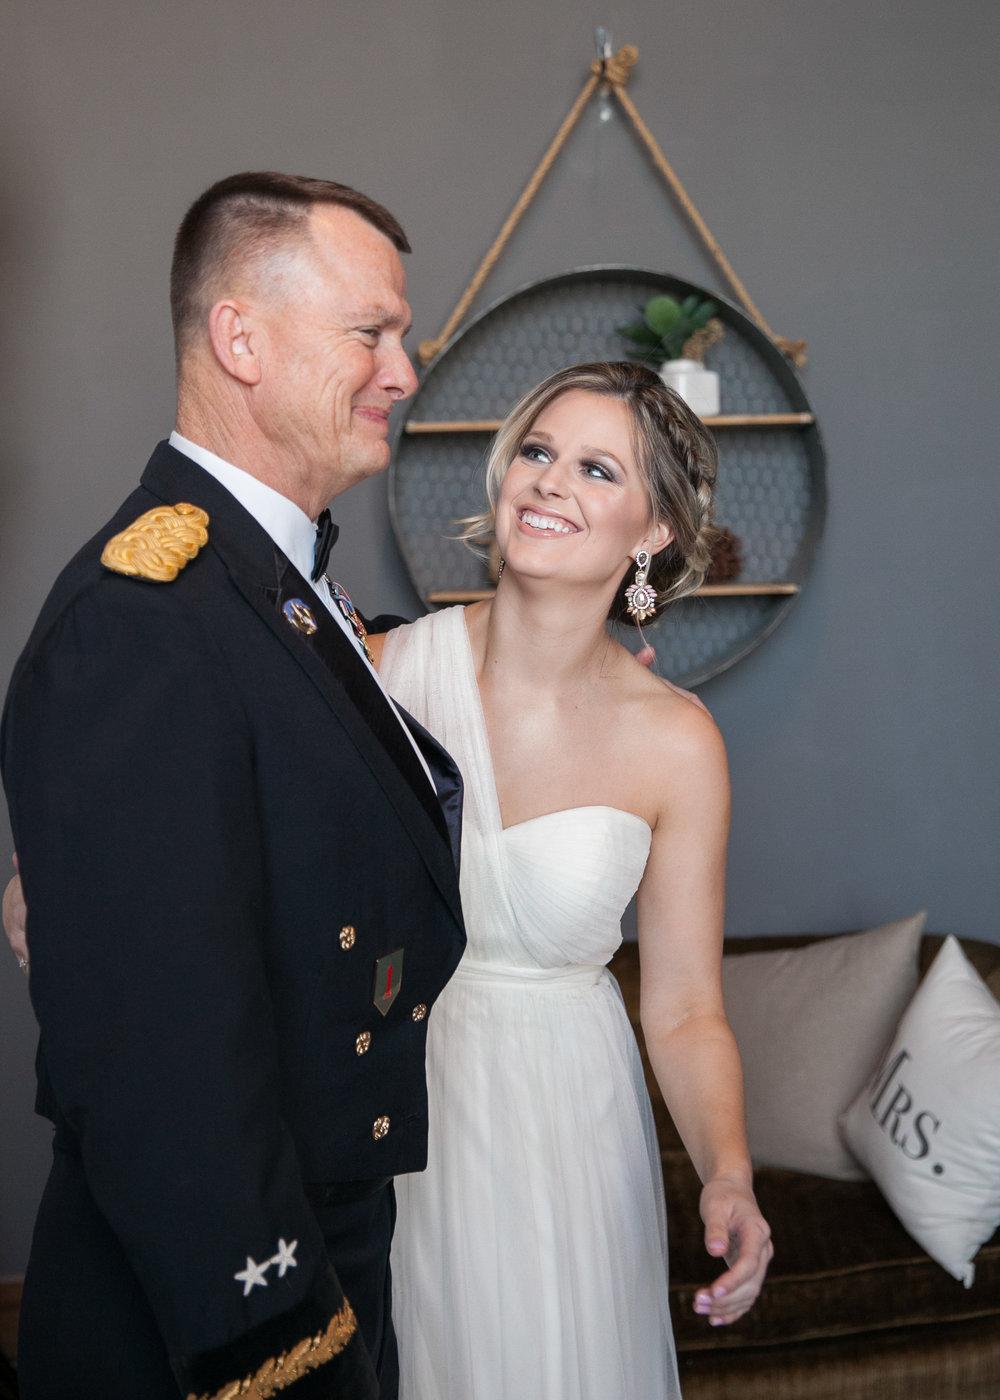 Kansas+City-Small+Wedding_Venue_Elope_Intimate_Ceremony_Memorial+Day_2.jpg